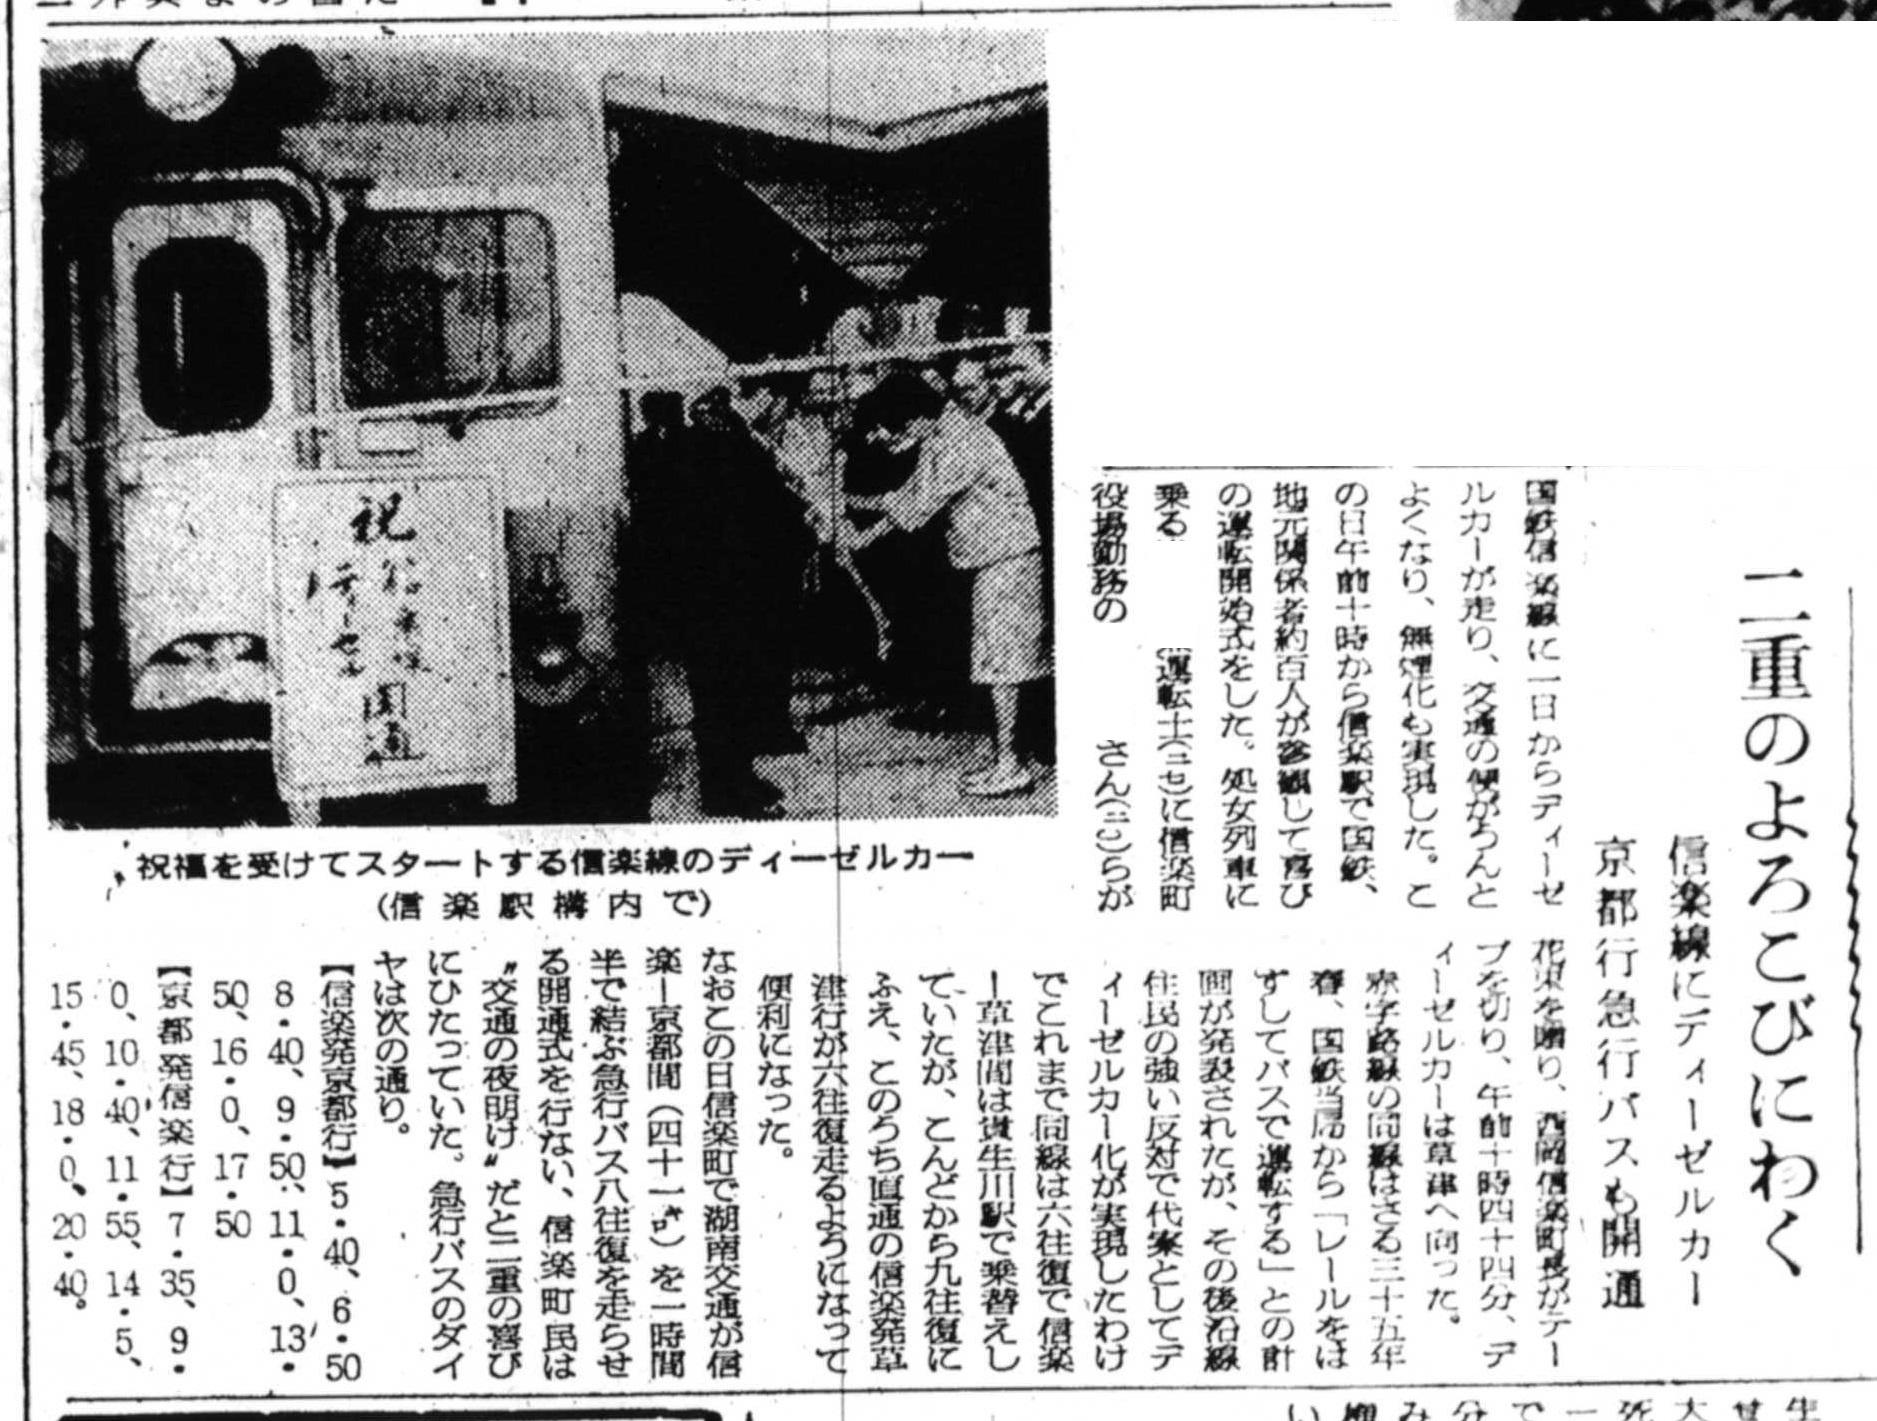 S37.5.2A 湖南交通信楽‐京都線開通 信楽線ディーゼルカー入線b